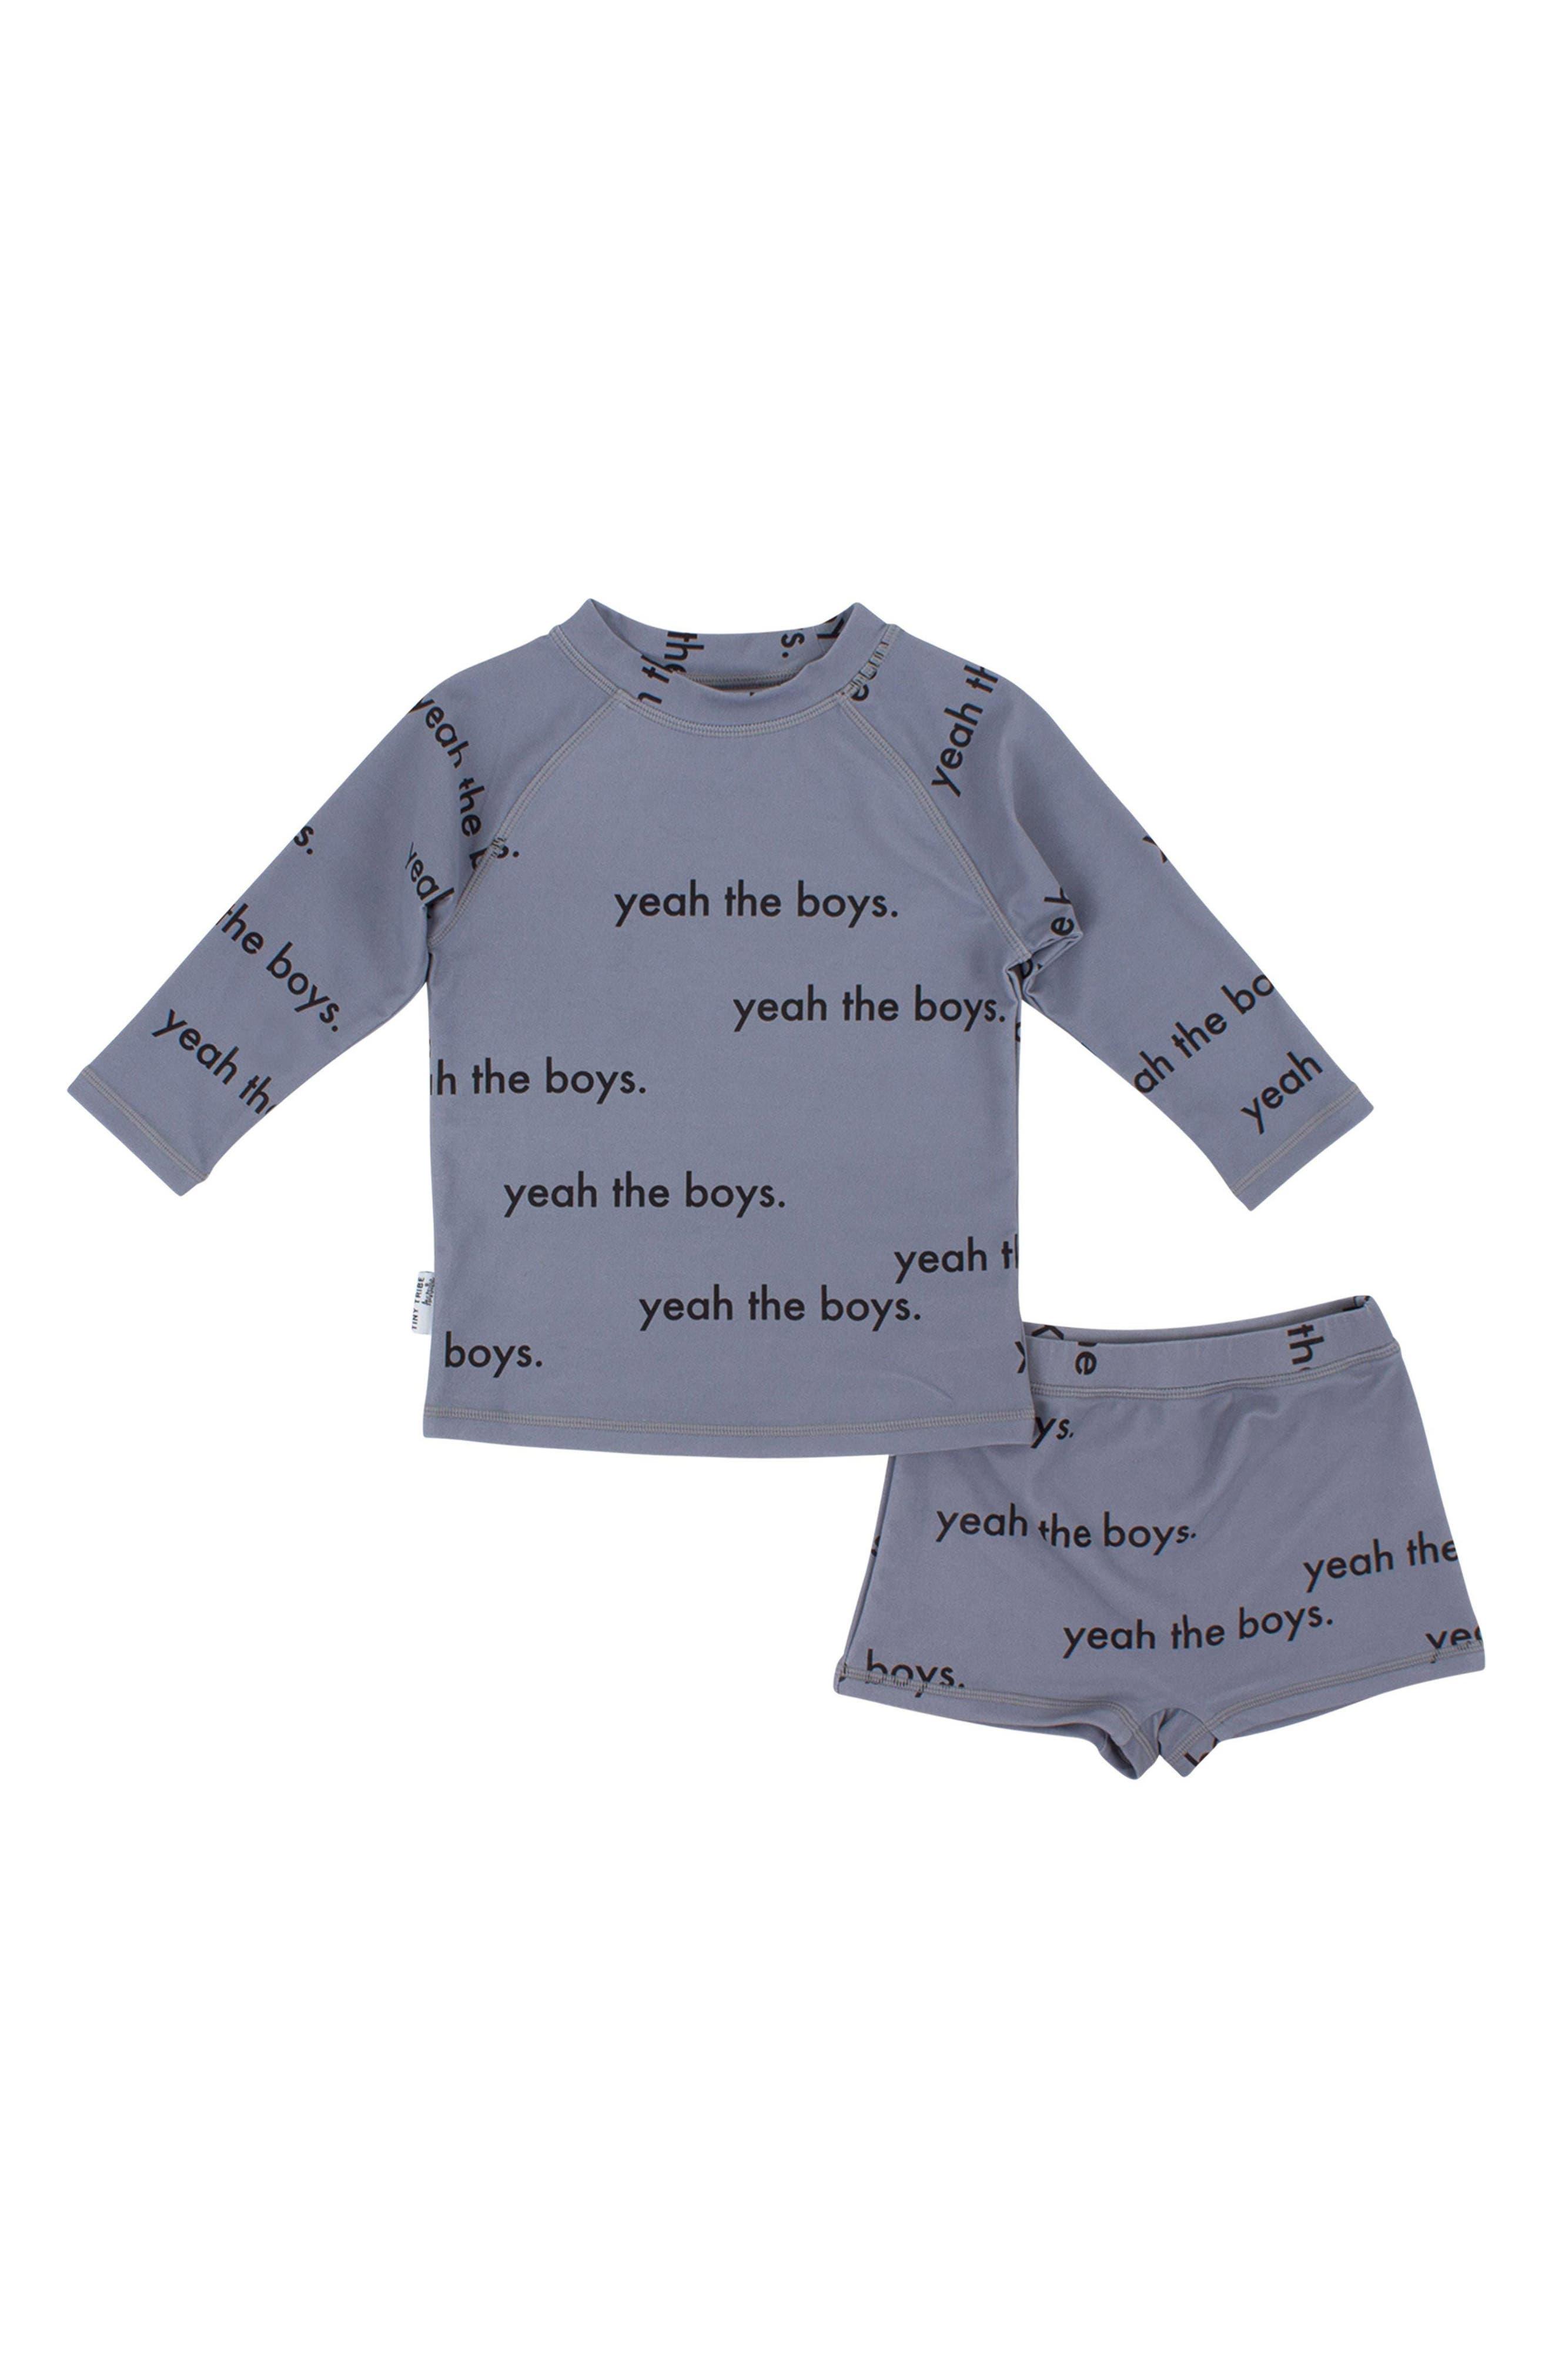 Tiny Tribe Yeah the Boys Rashguard & Shorts Set (Toddler Boys & Little Boys)